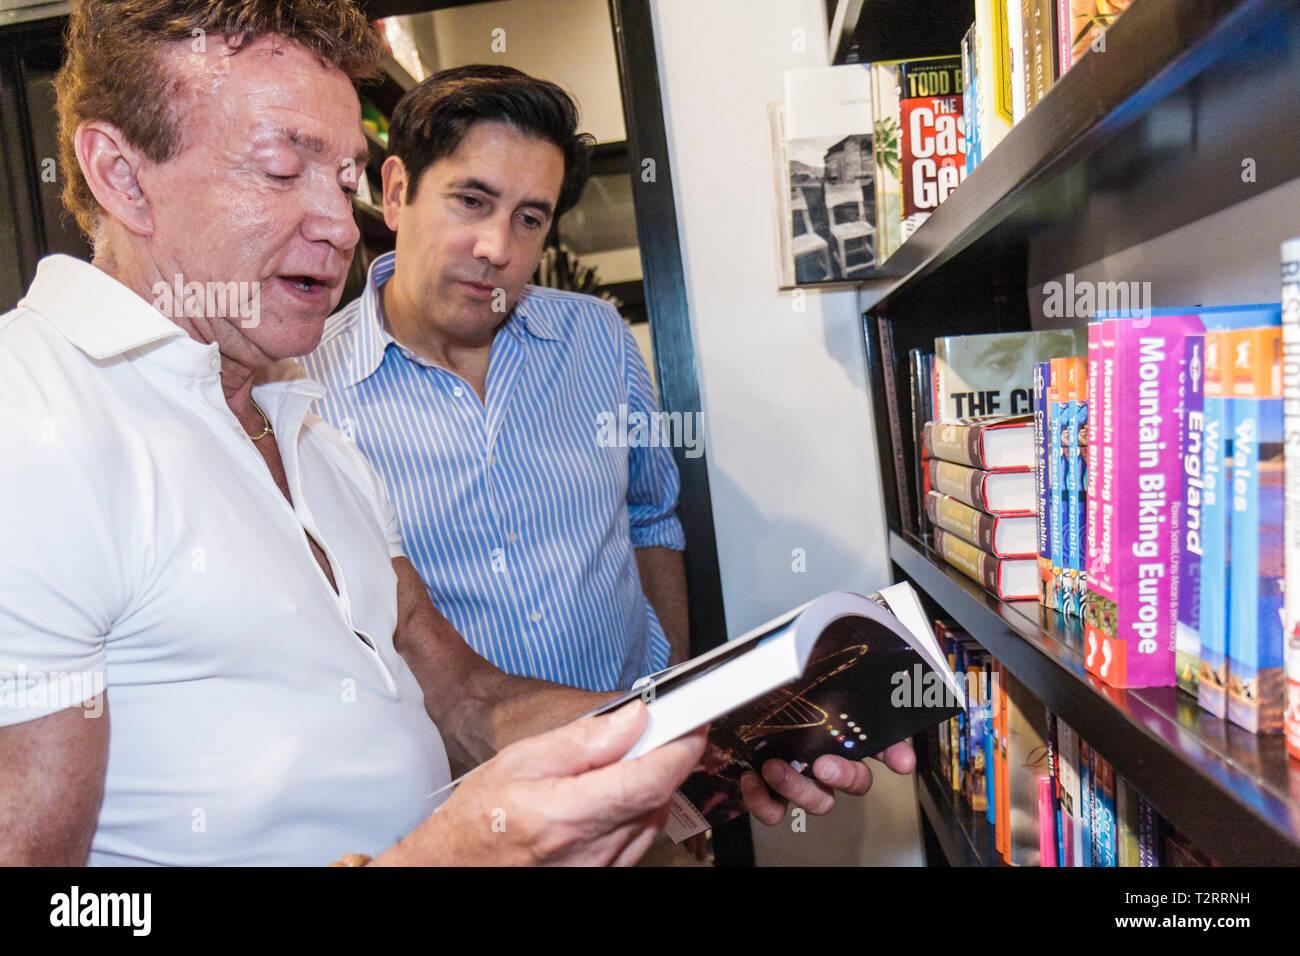 Miami Beach Florida Lincoln Road pedestrian mall shopping Gay Pride Event Books and Books man men shelves travel shopping readin - Stock Image